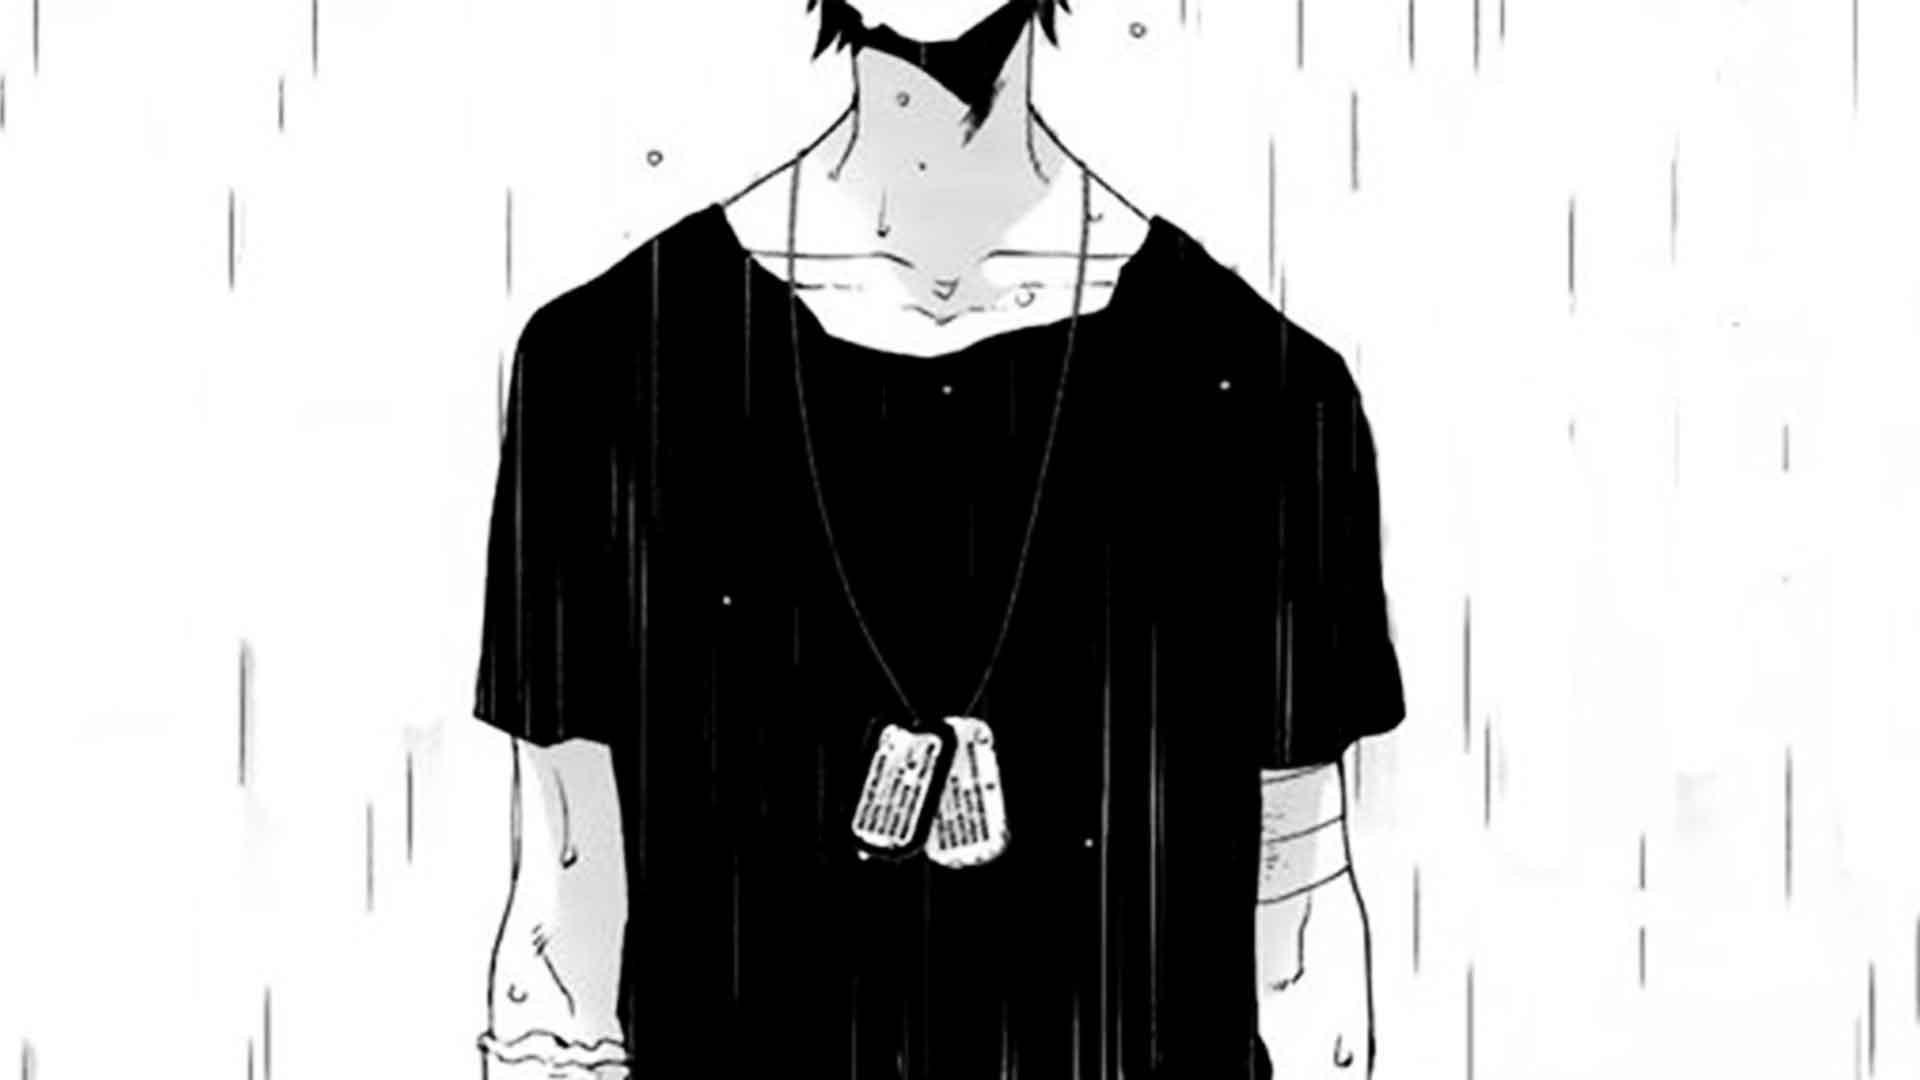 sad-anime-boy-rain.jpg (1920×1080) | Anime i Manga | Pinterest | Manga and  Anime